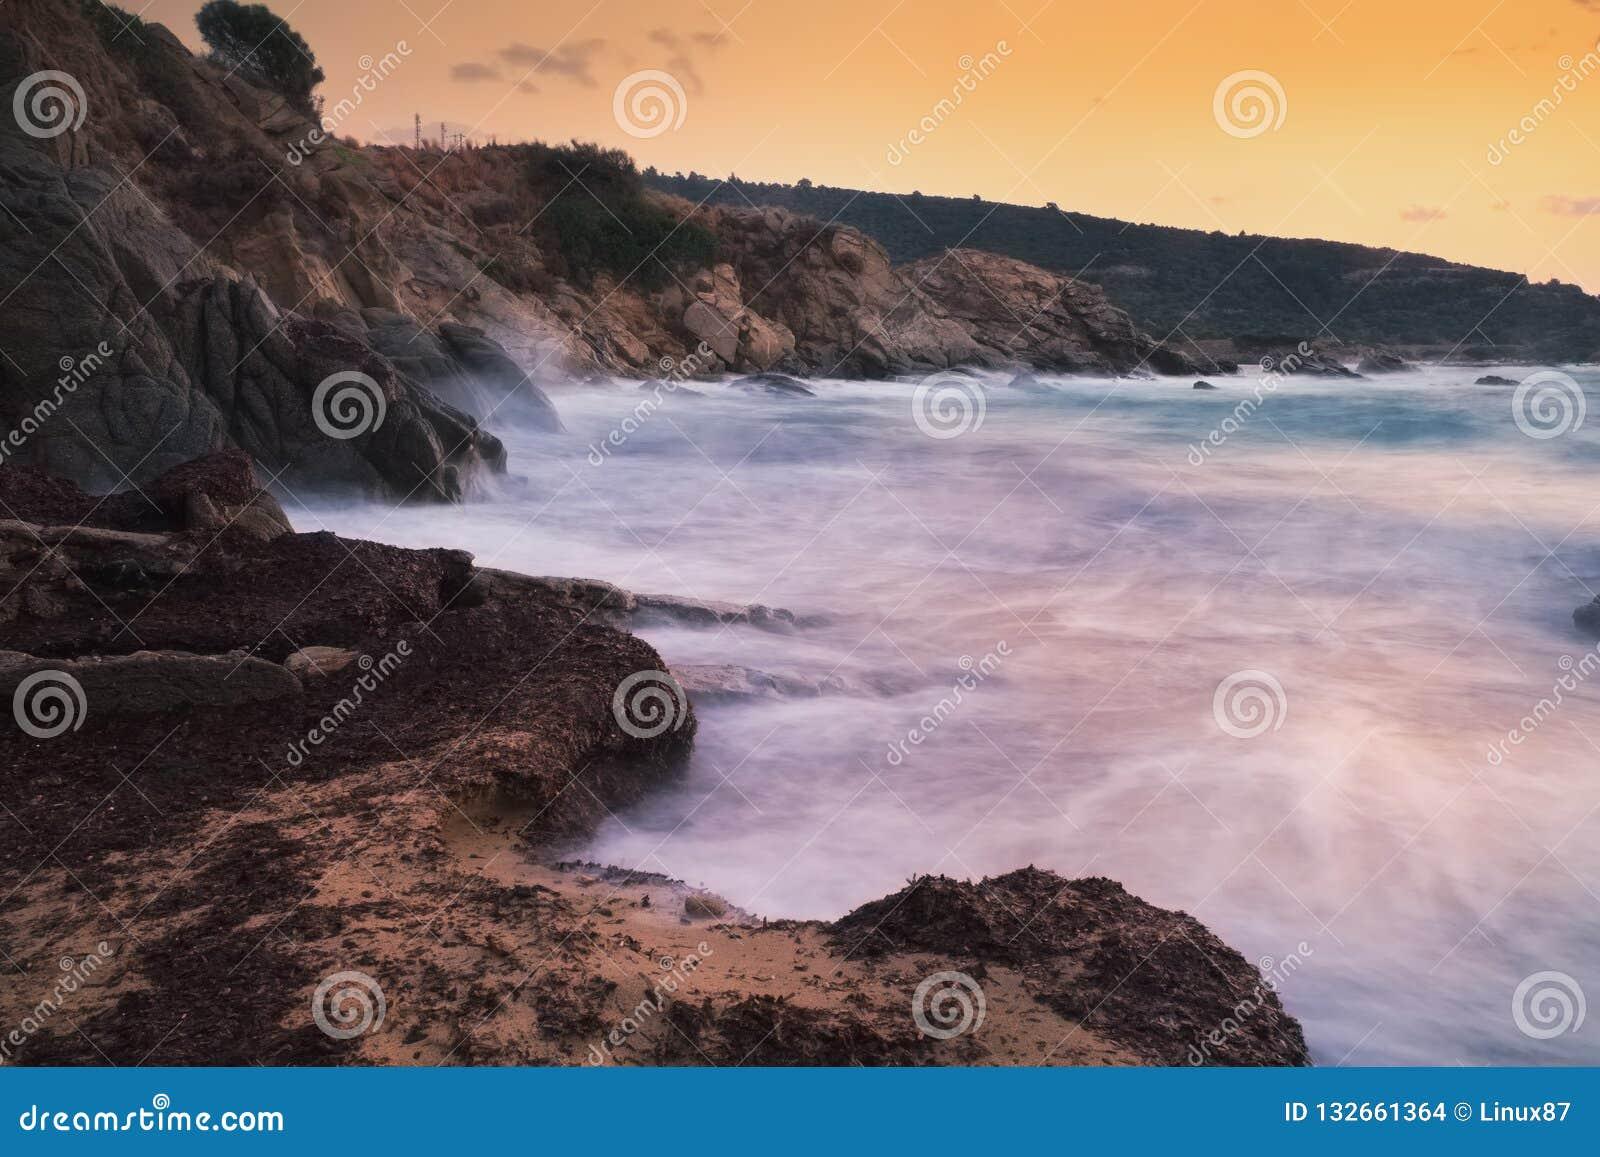 Long exposure sunset seascape